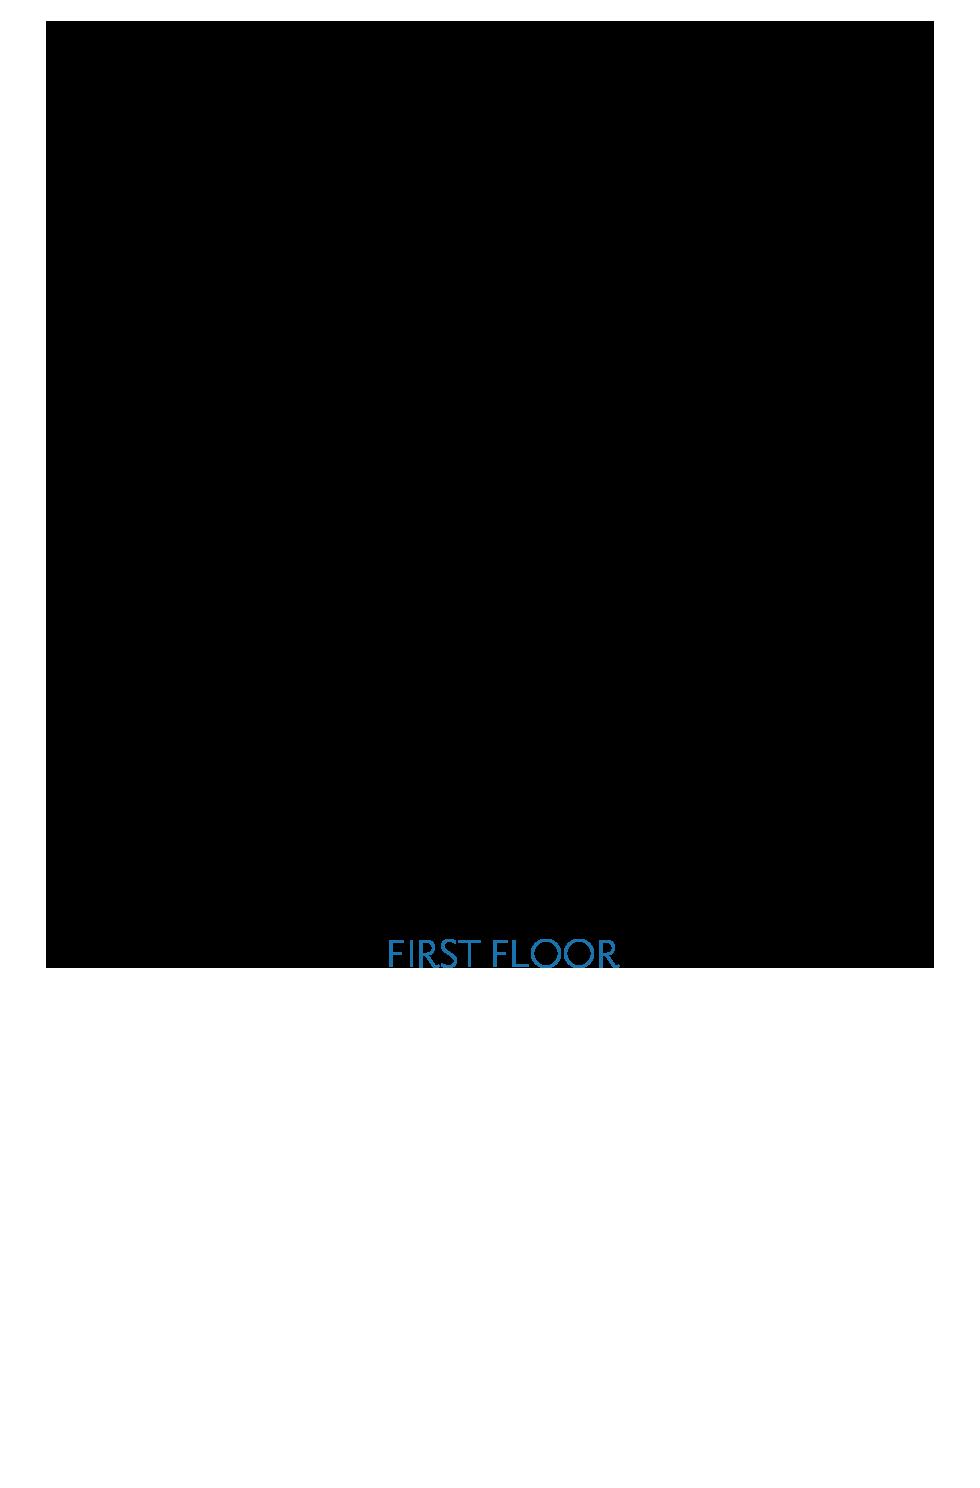 Splash at One Lake Floor Plan | Residence 1 | Floor 1